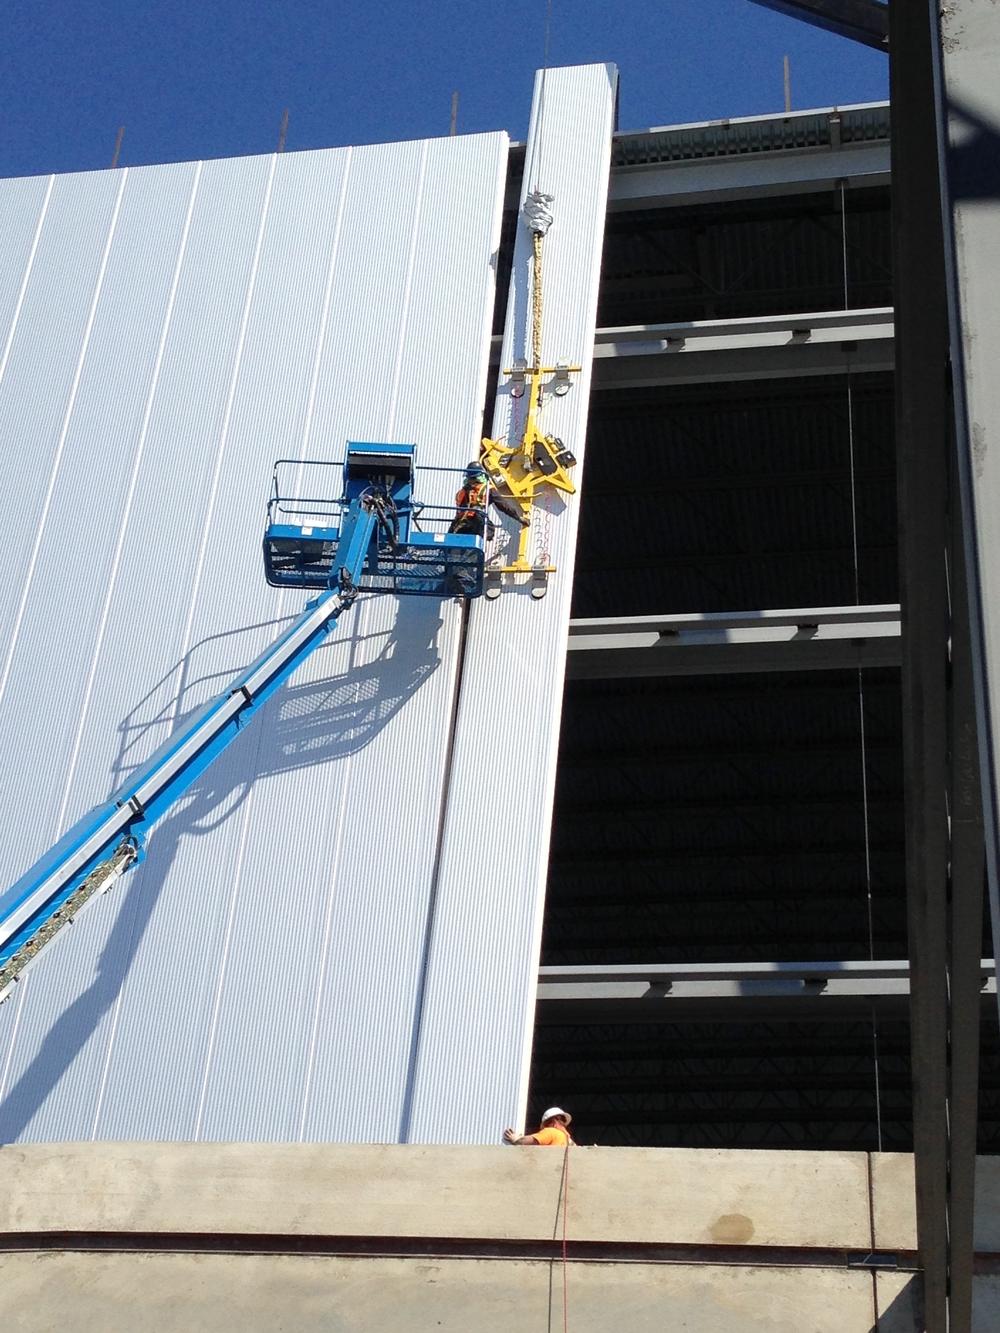 Insulated Metal Panels | Cold Storage Construction u2014 DeGraff Development | Metal Buildings | Design Build |Cold Storage & Insulated Metal Panels | Cold Storage Construction u2014 DeGraff ...